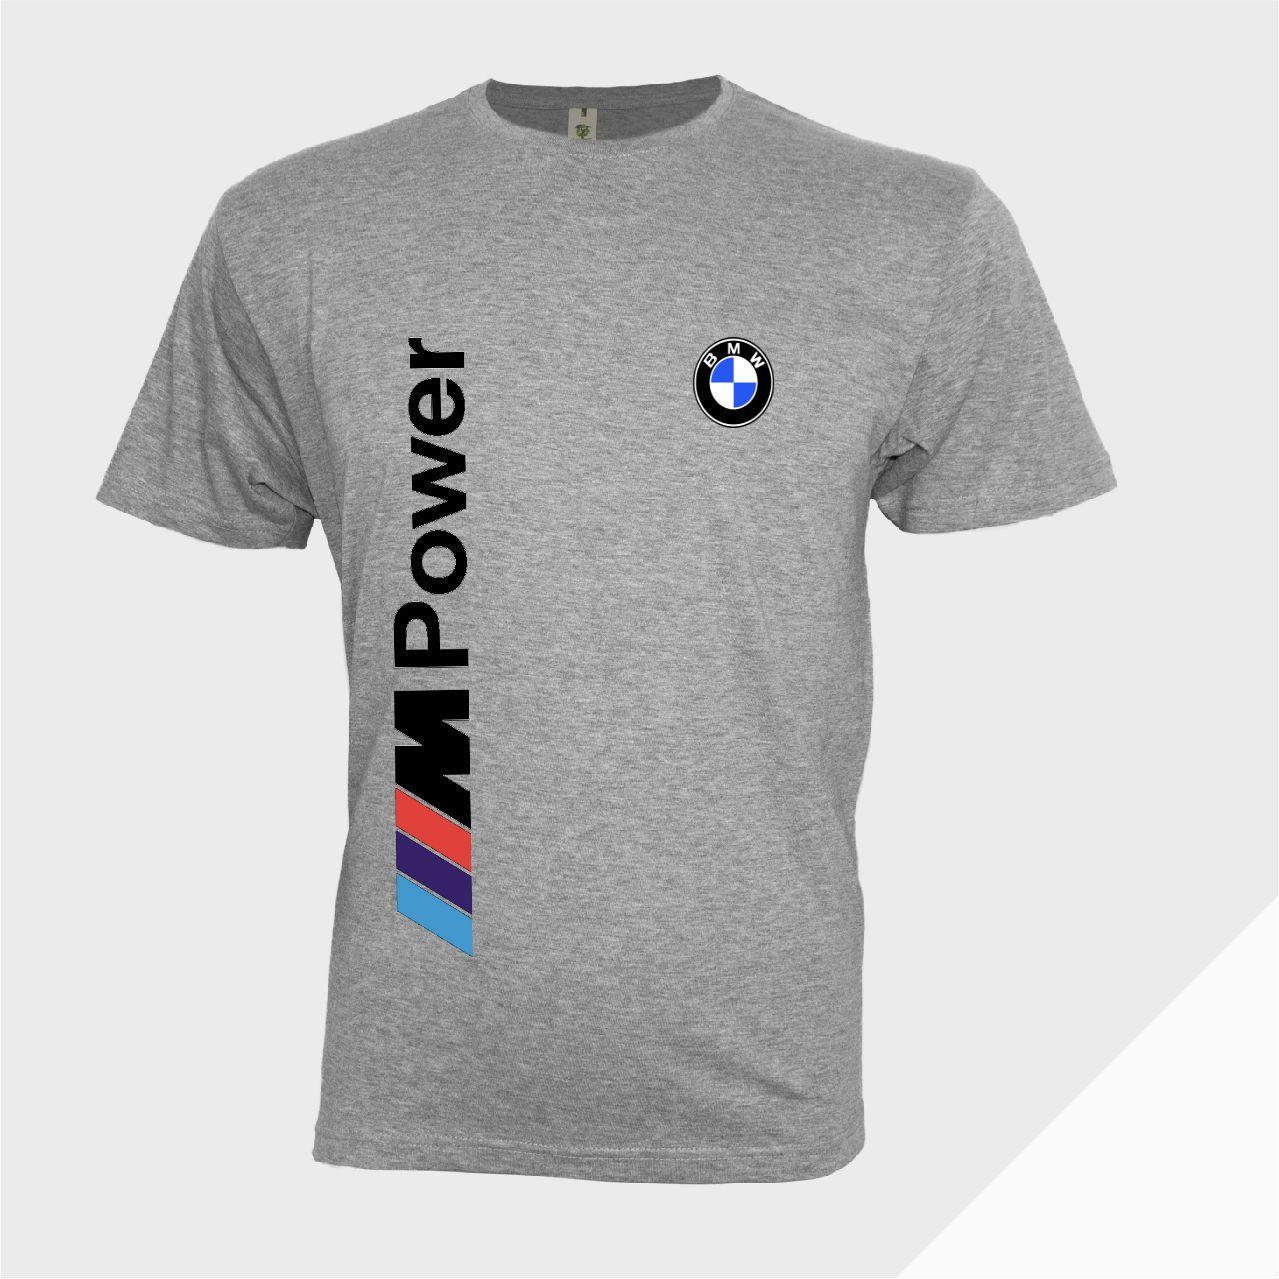 fbe0d9484b415c IMpower Men Tshirt Power Gildan All Colour Shirt Mens Classics Tee Shirt  Printed T Shirt Summer Cotton T Shirt Shirts Mens Cool T Shirts Designs  From ...